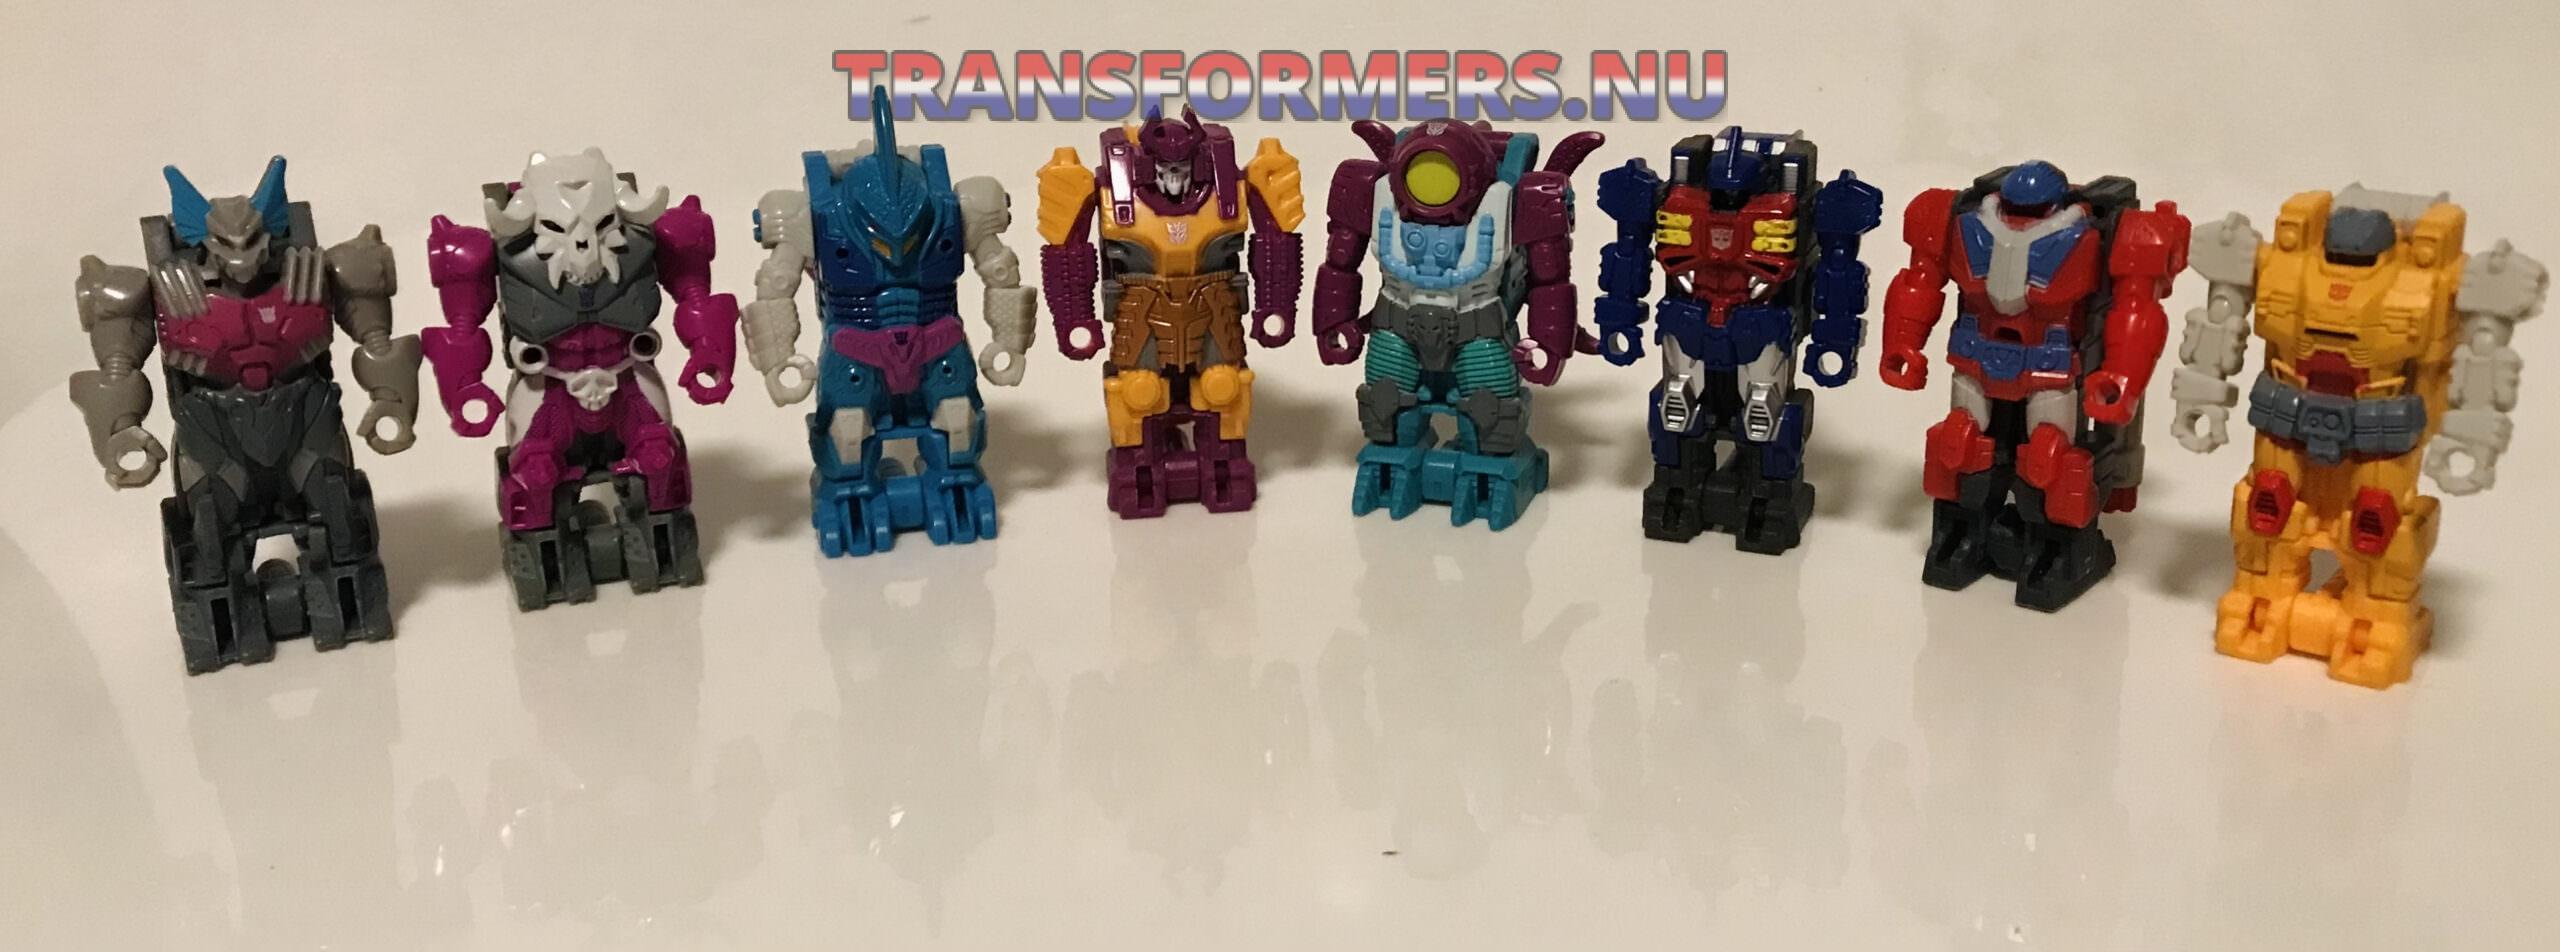 Power of the Primes Pretenders image